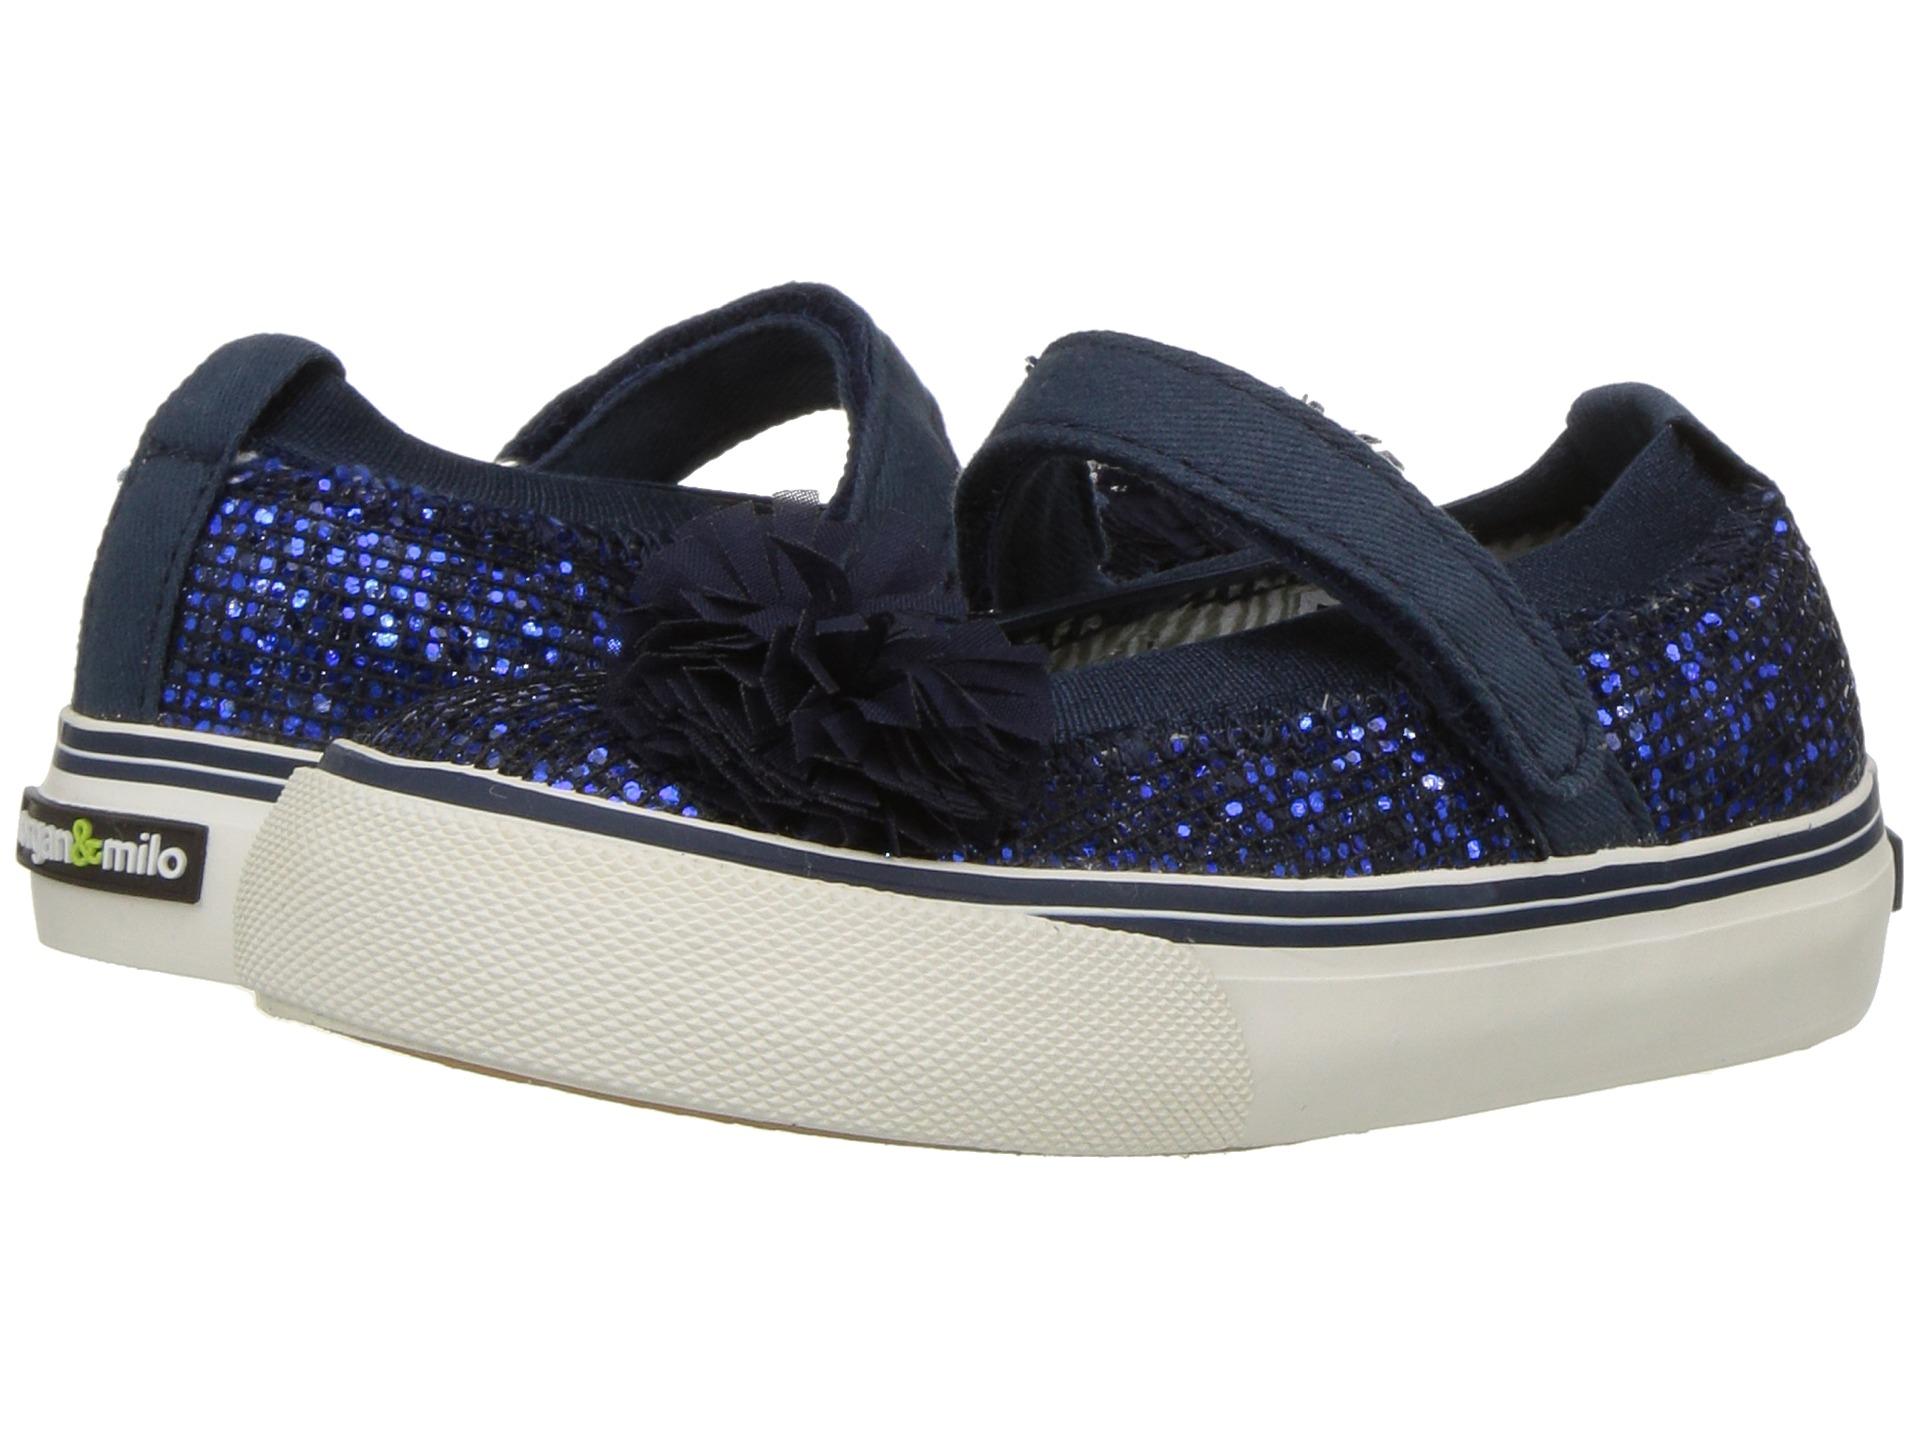 Morgan Milo Sale Shoes